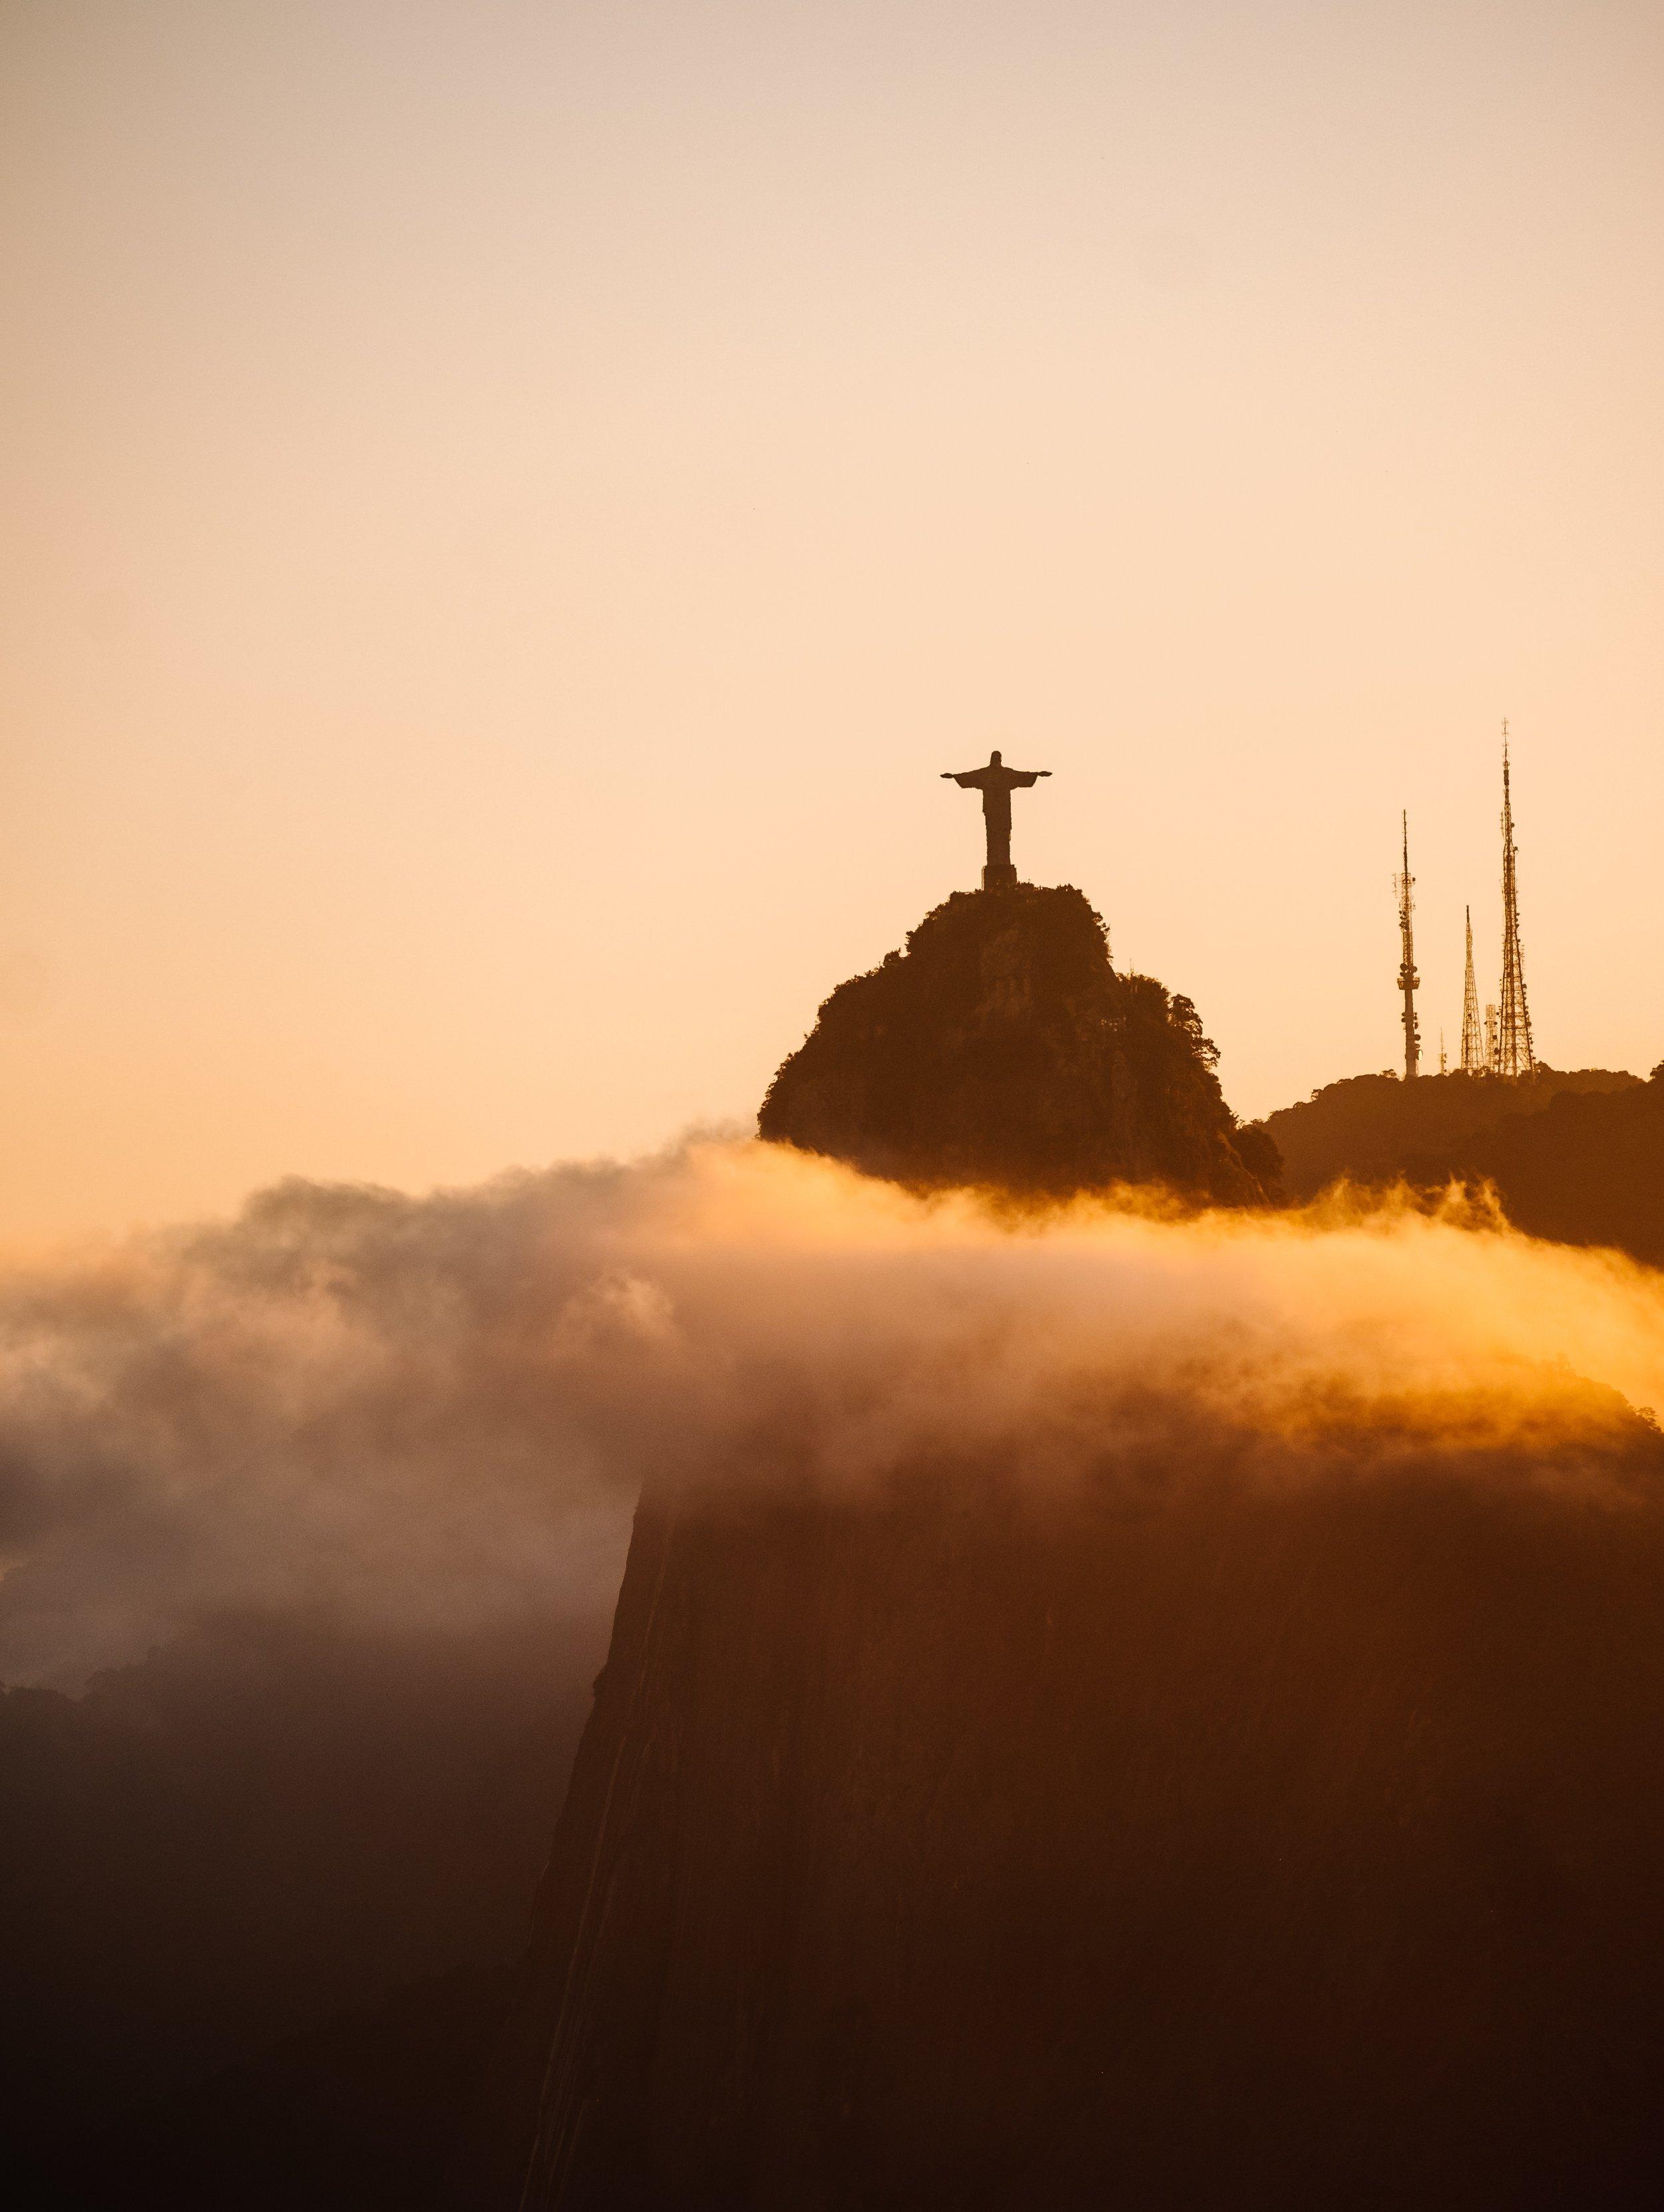 Christ the redeemer statue in Brazil.